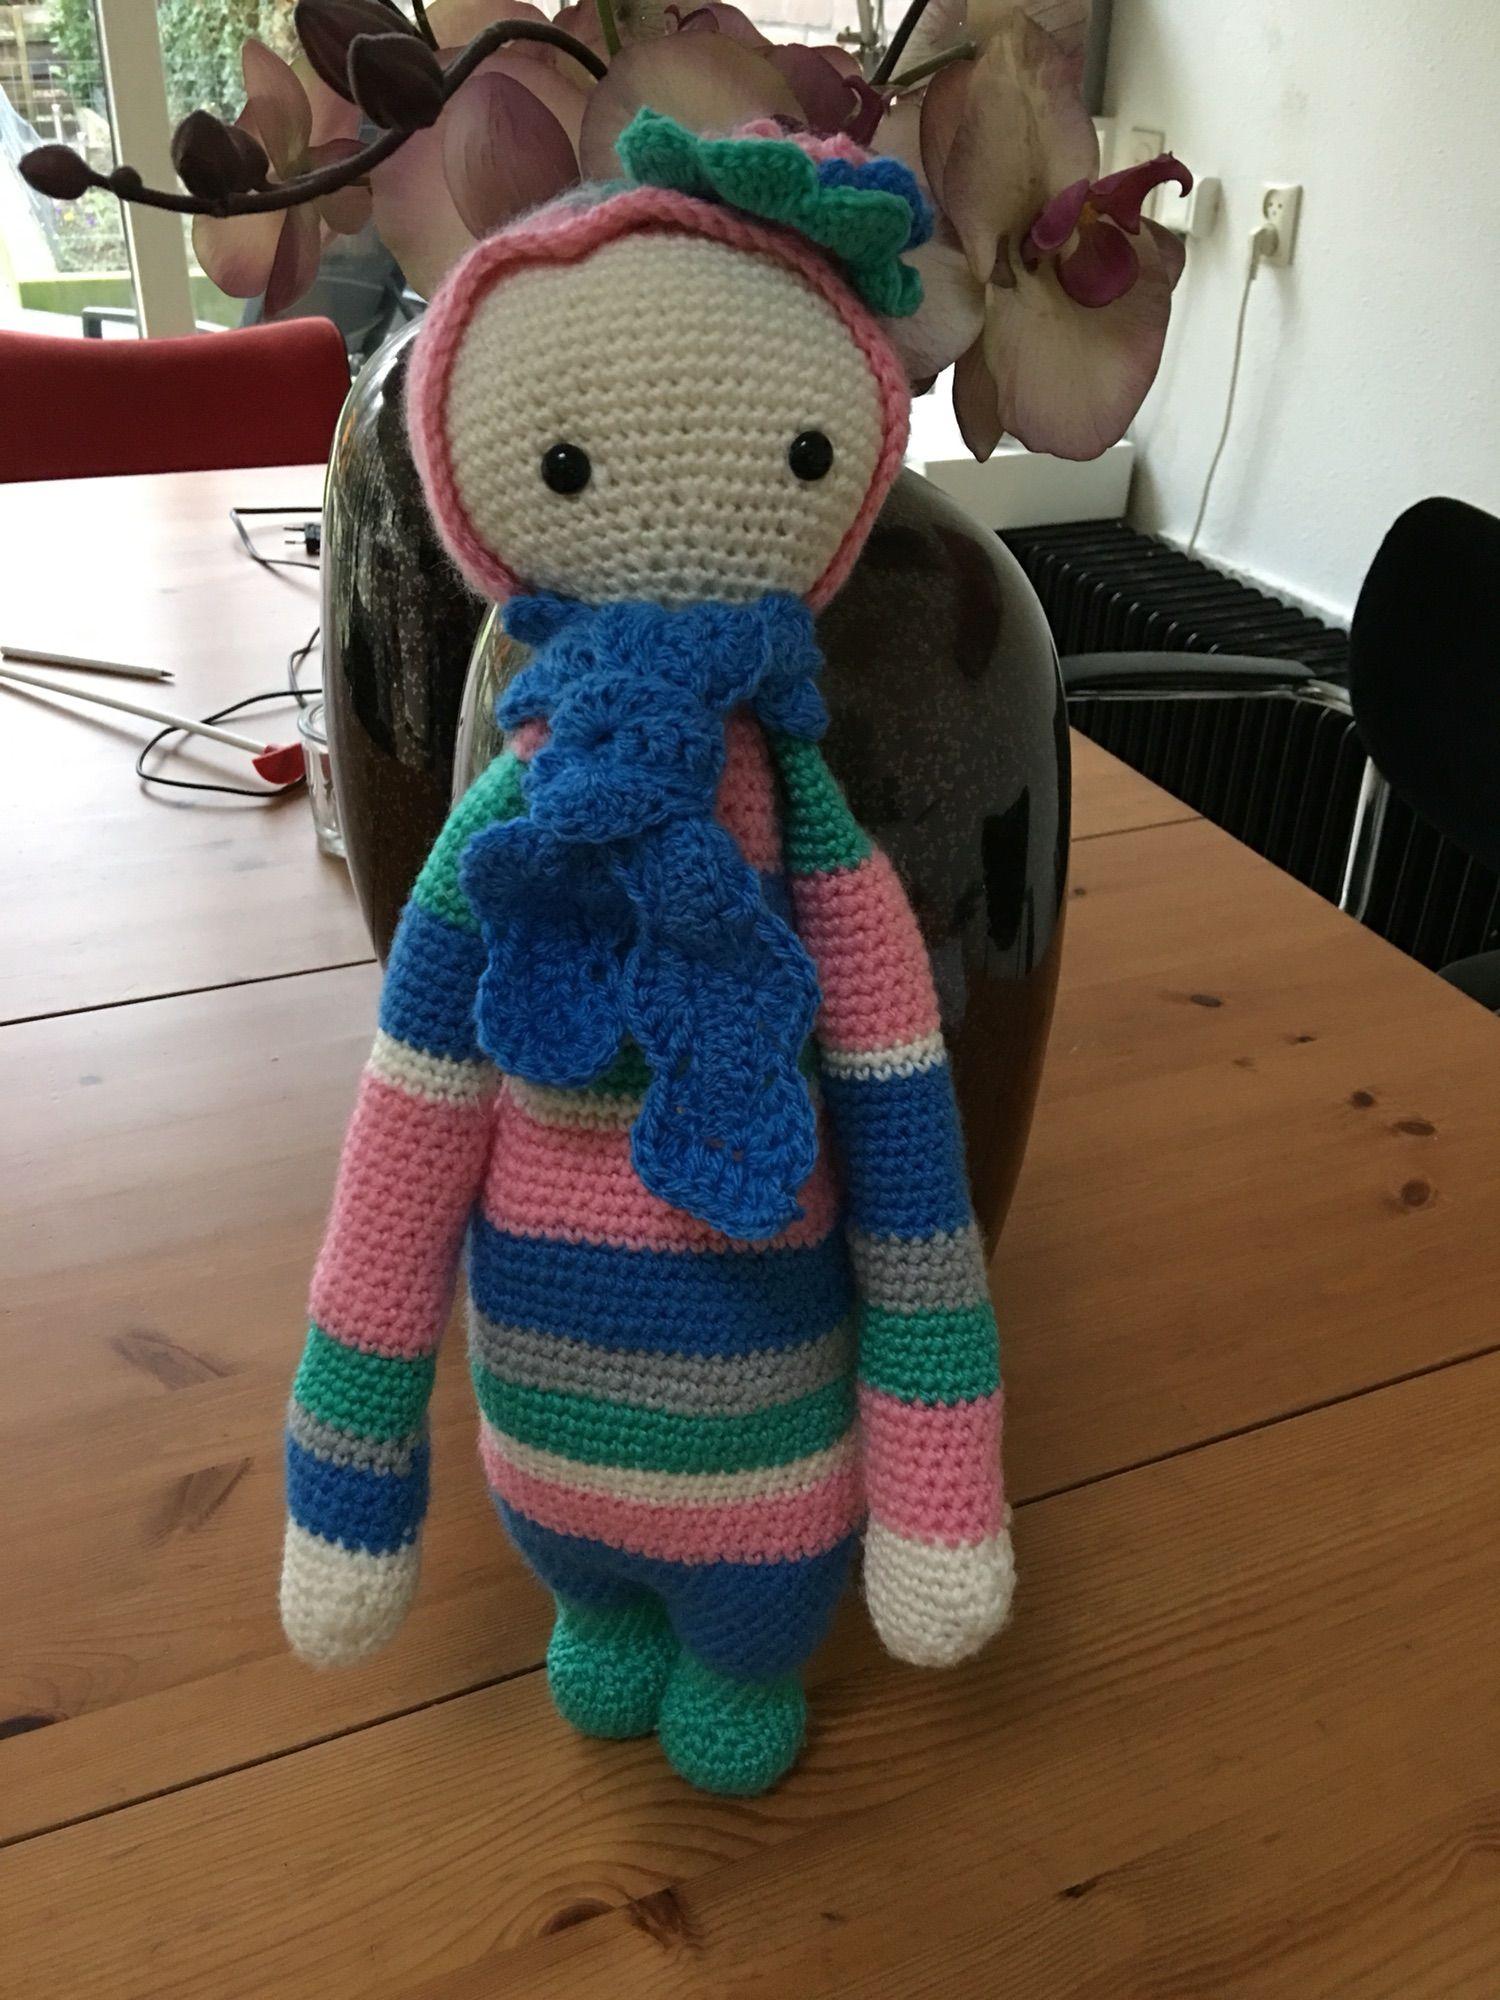 lalylala doll made by Hennie d. H. / based on a lalylala crochet pattern